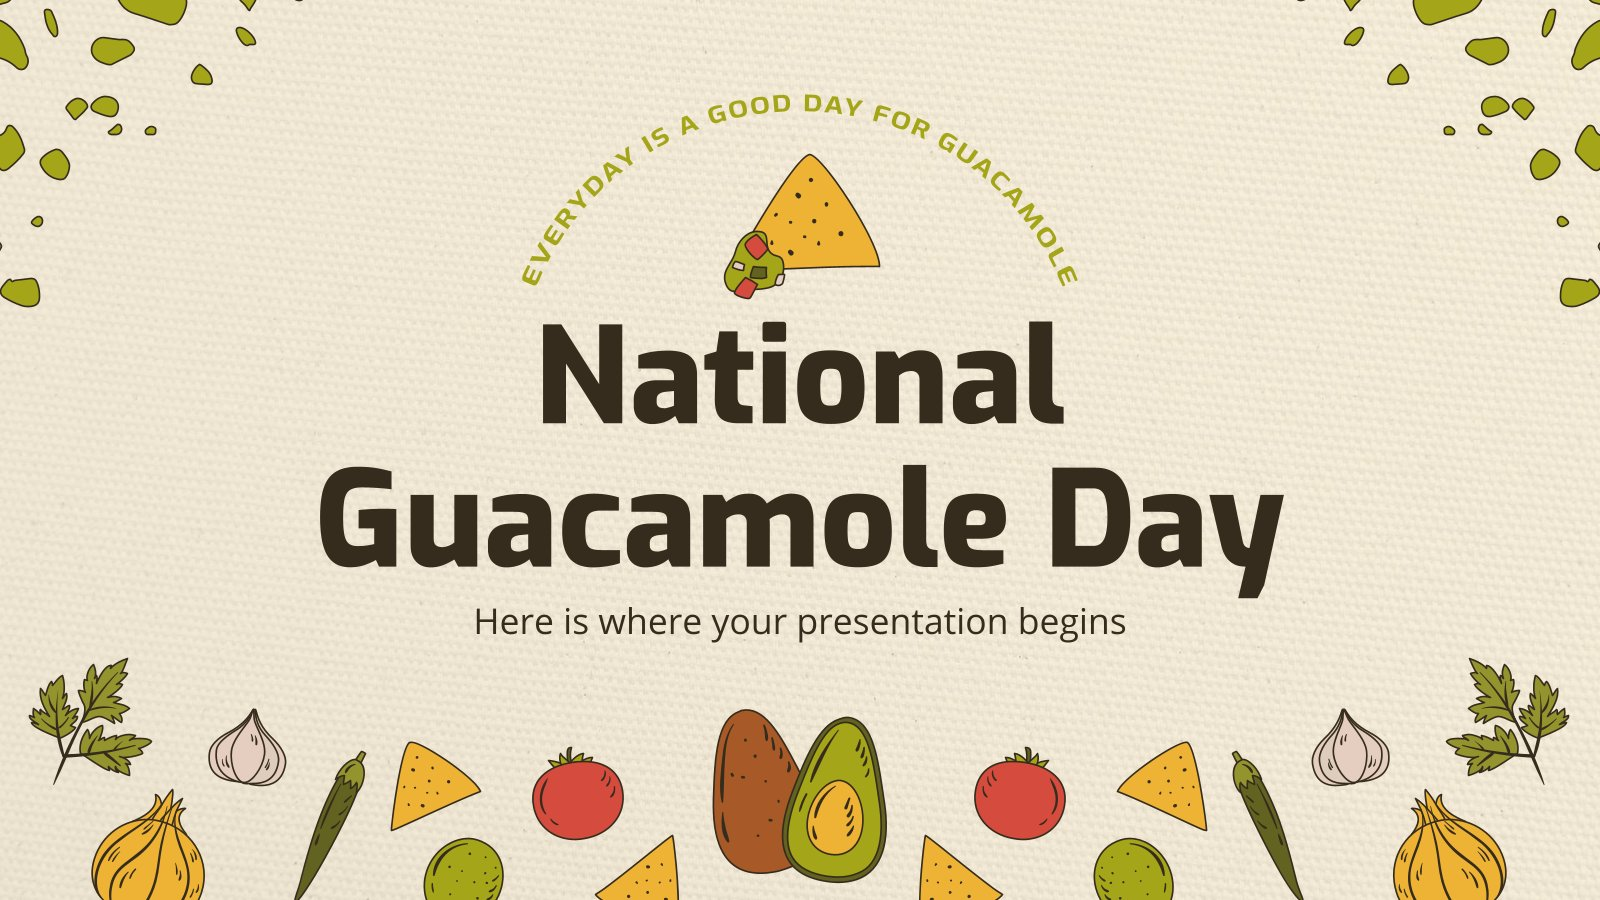 National Guacamole Day presentation template